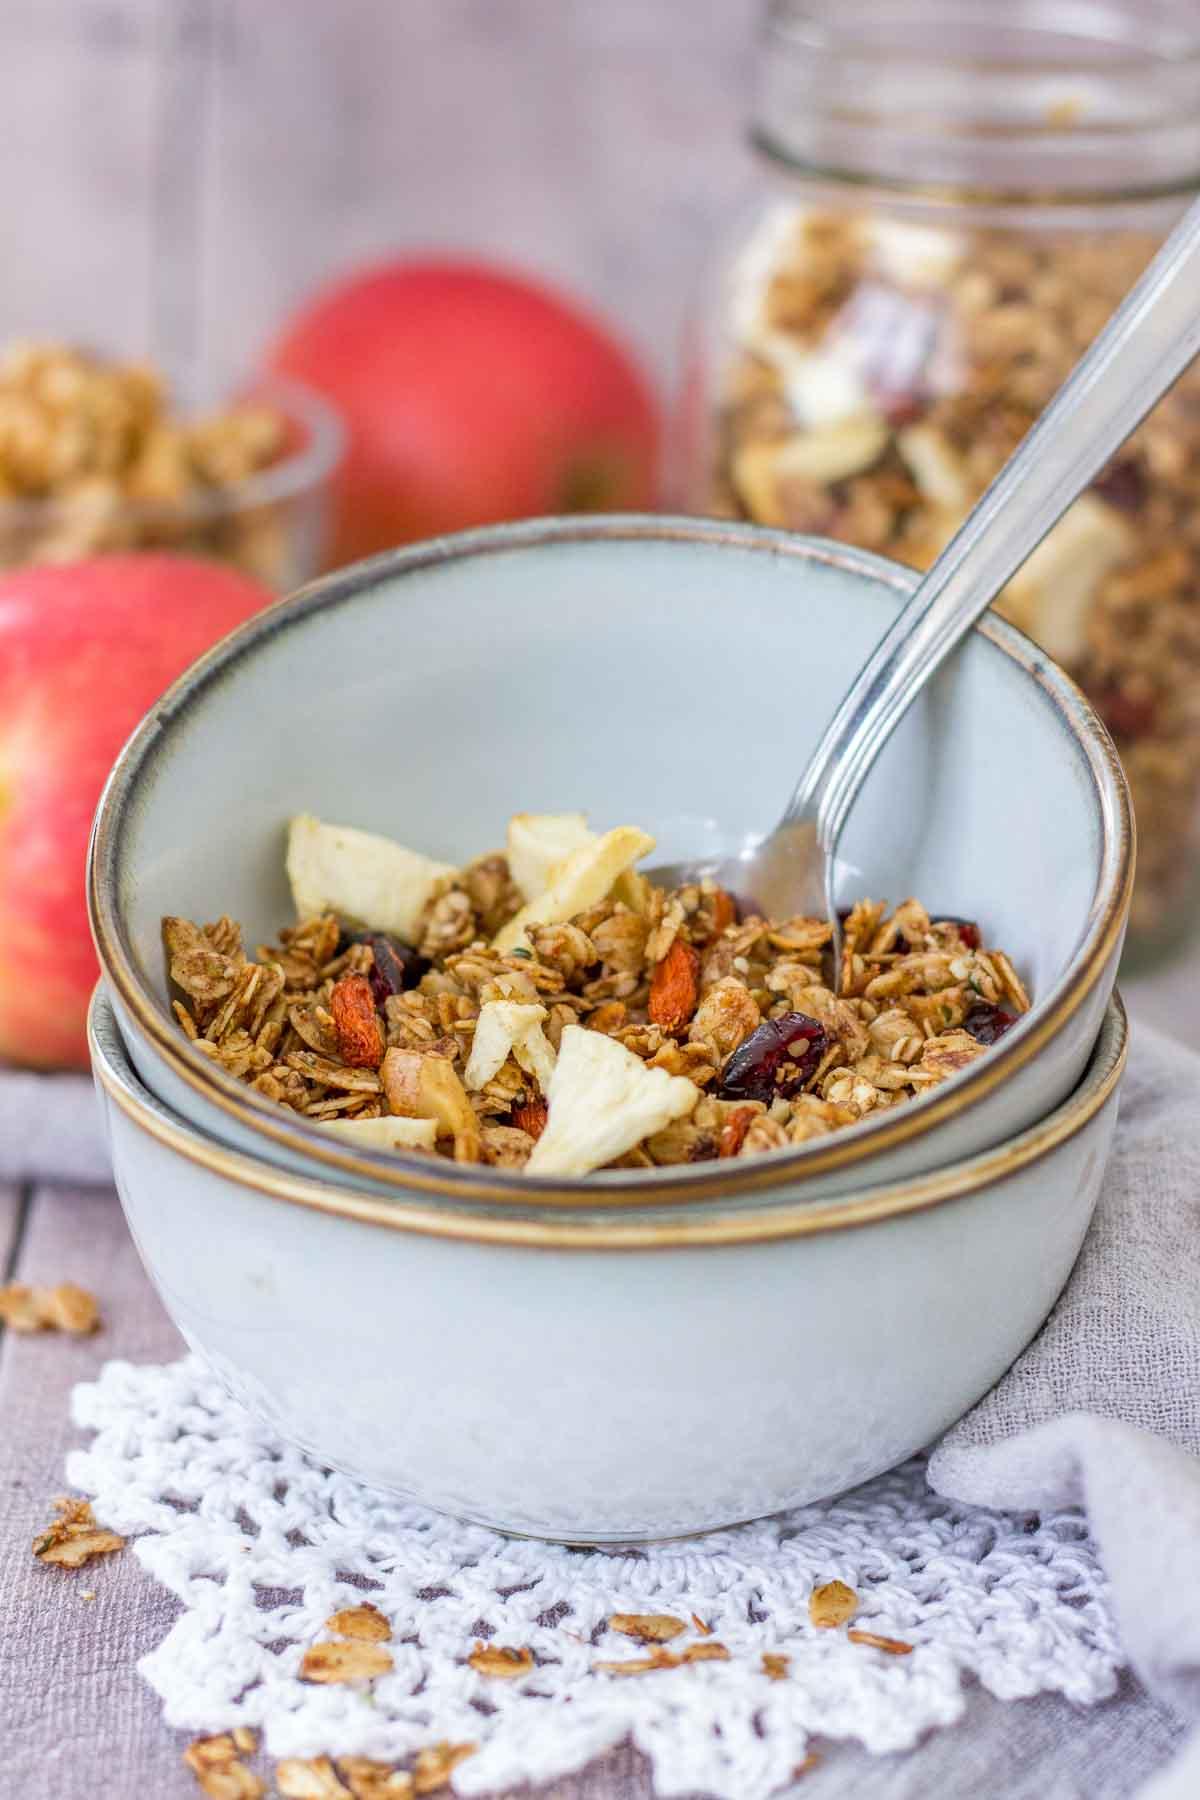 Apple Cinnamon Granola served in a bowl